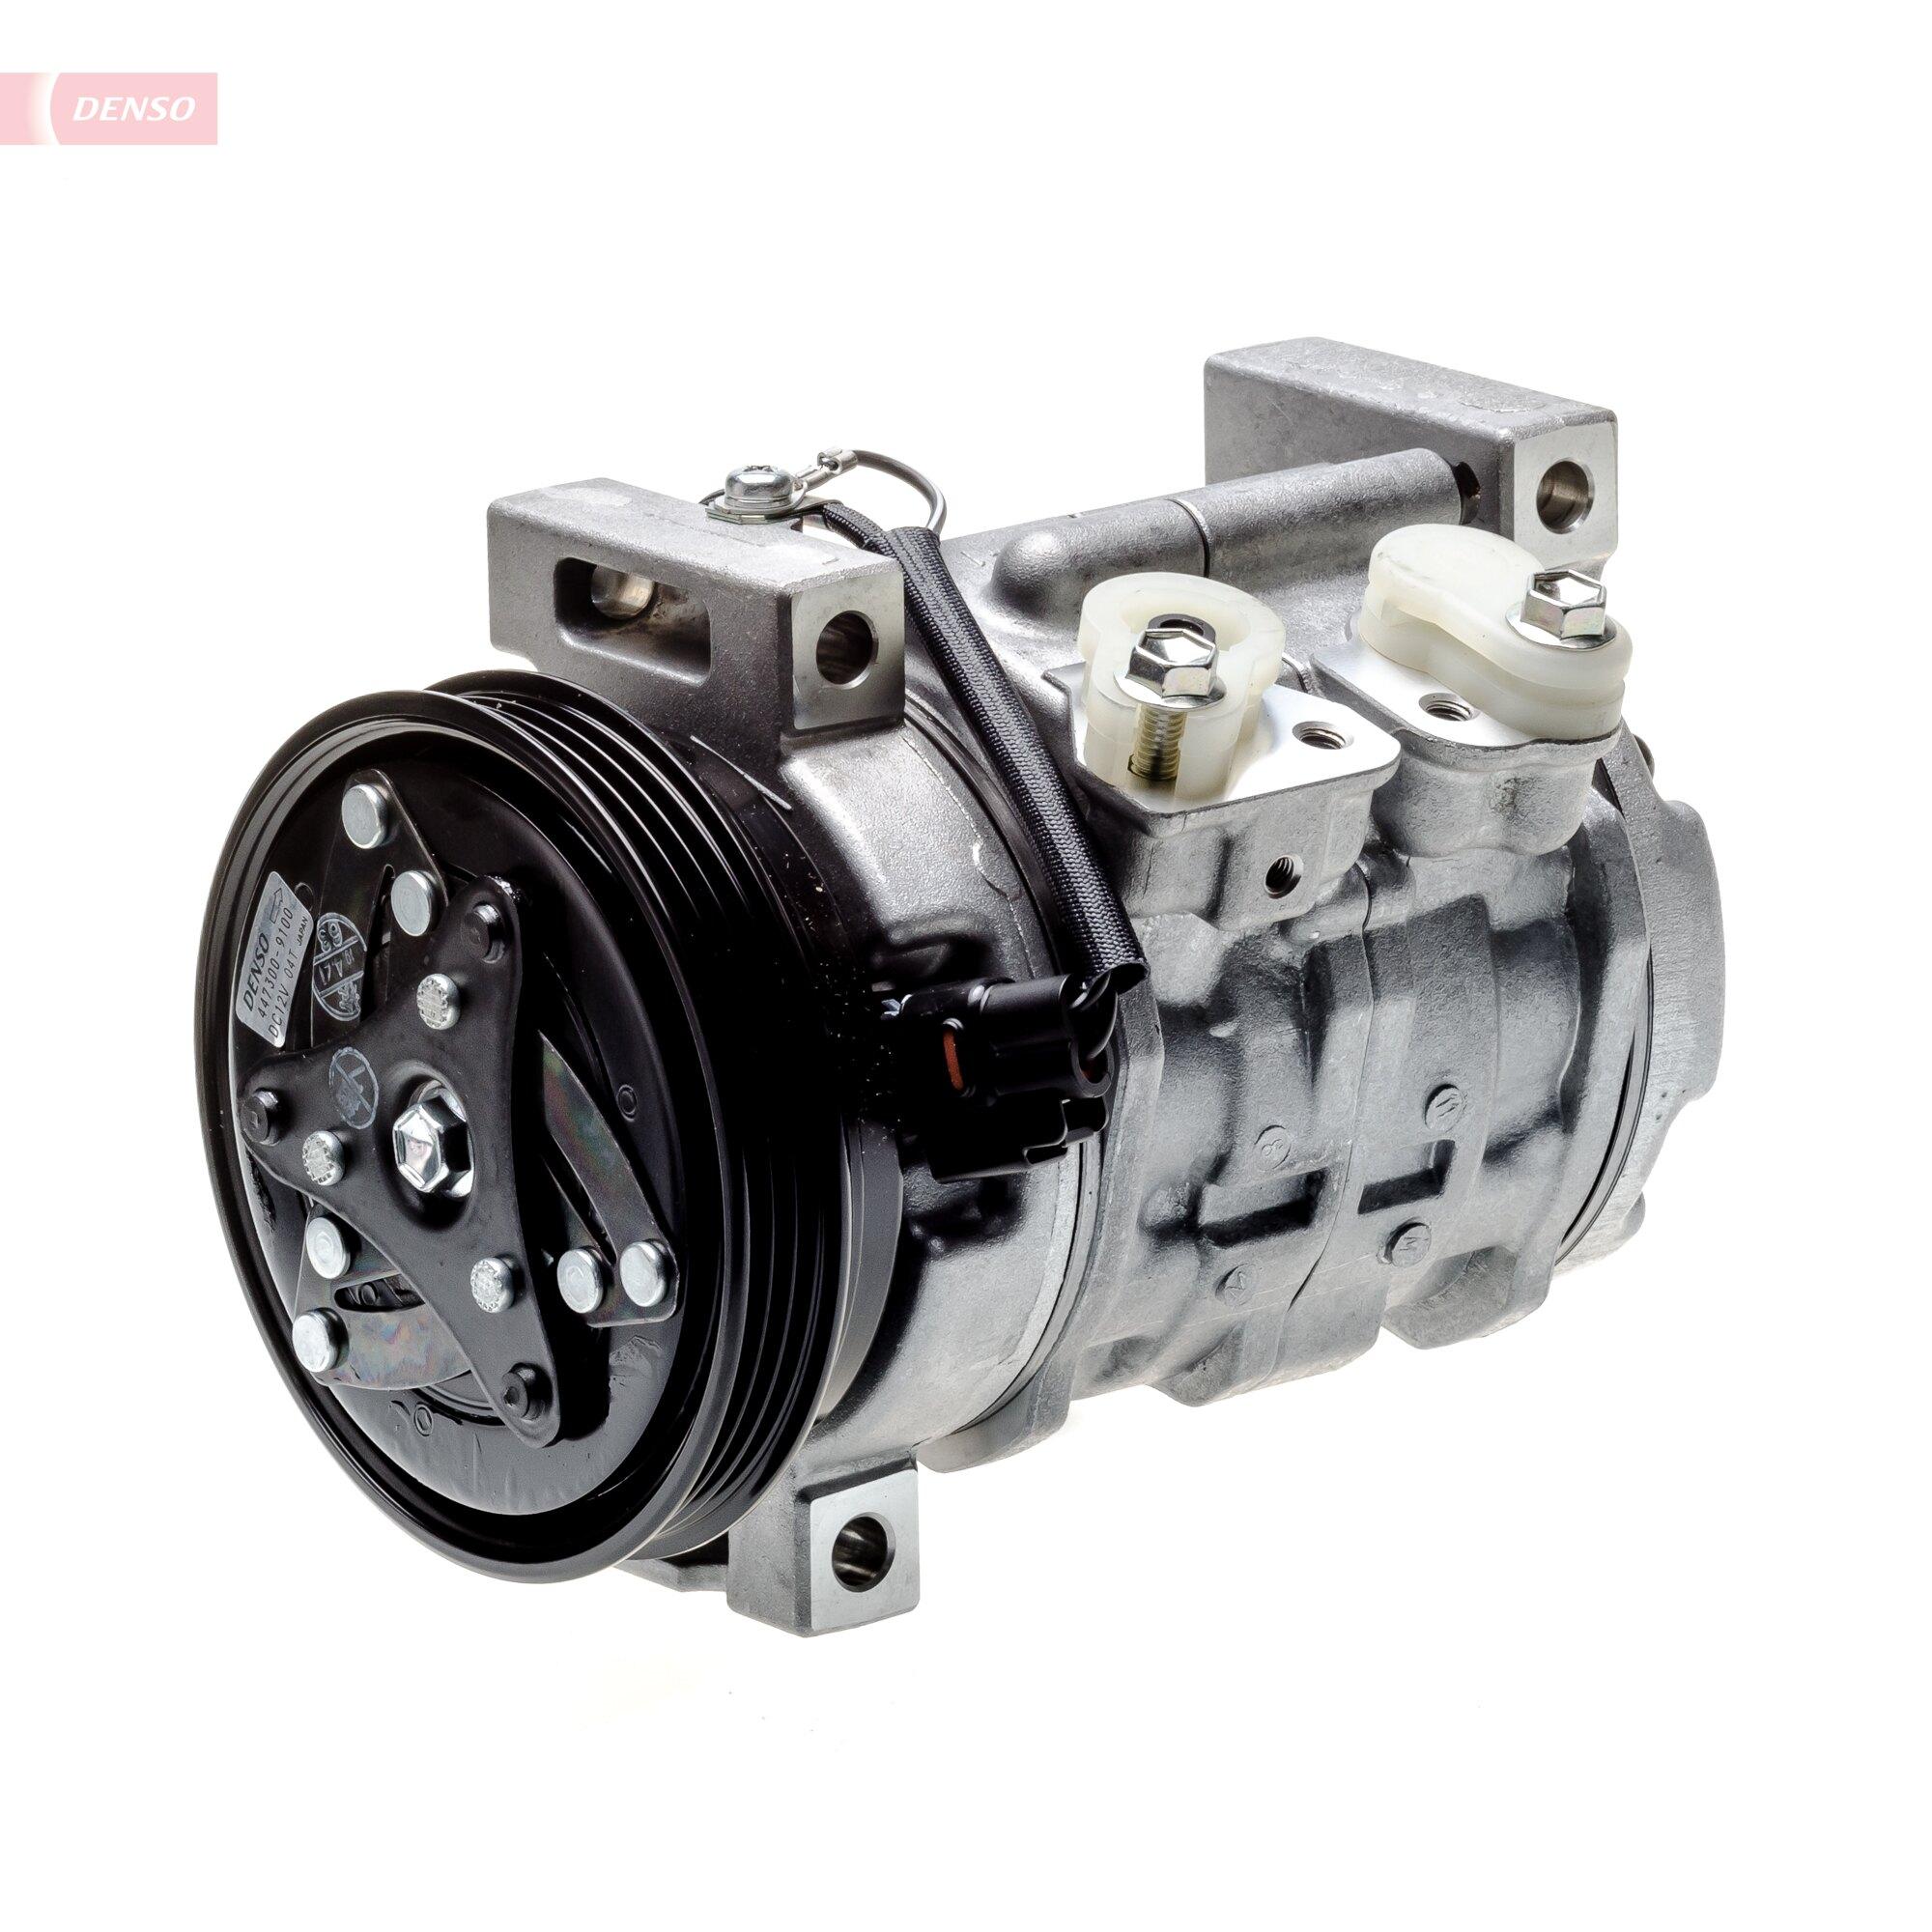 Kompresor klimatizace DENSO DCP47006